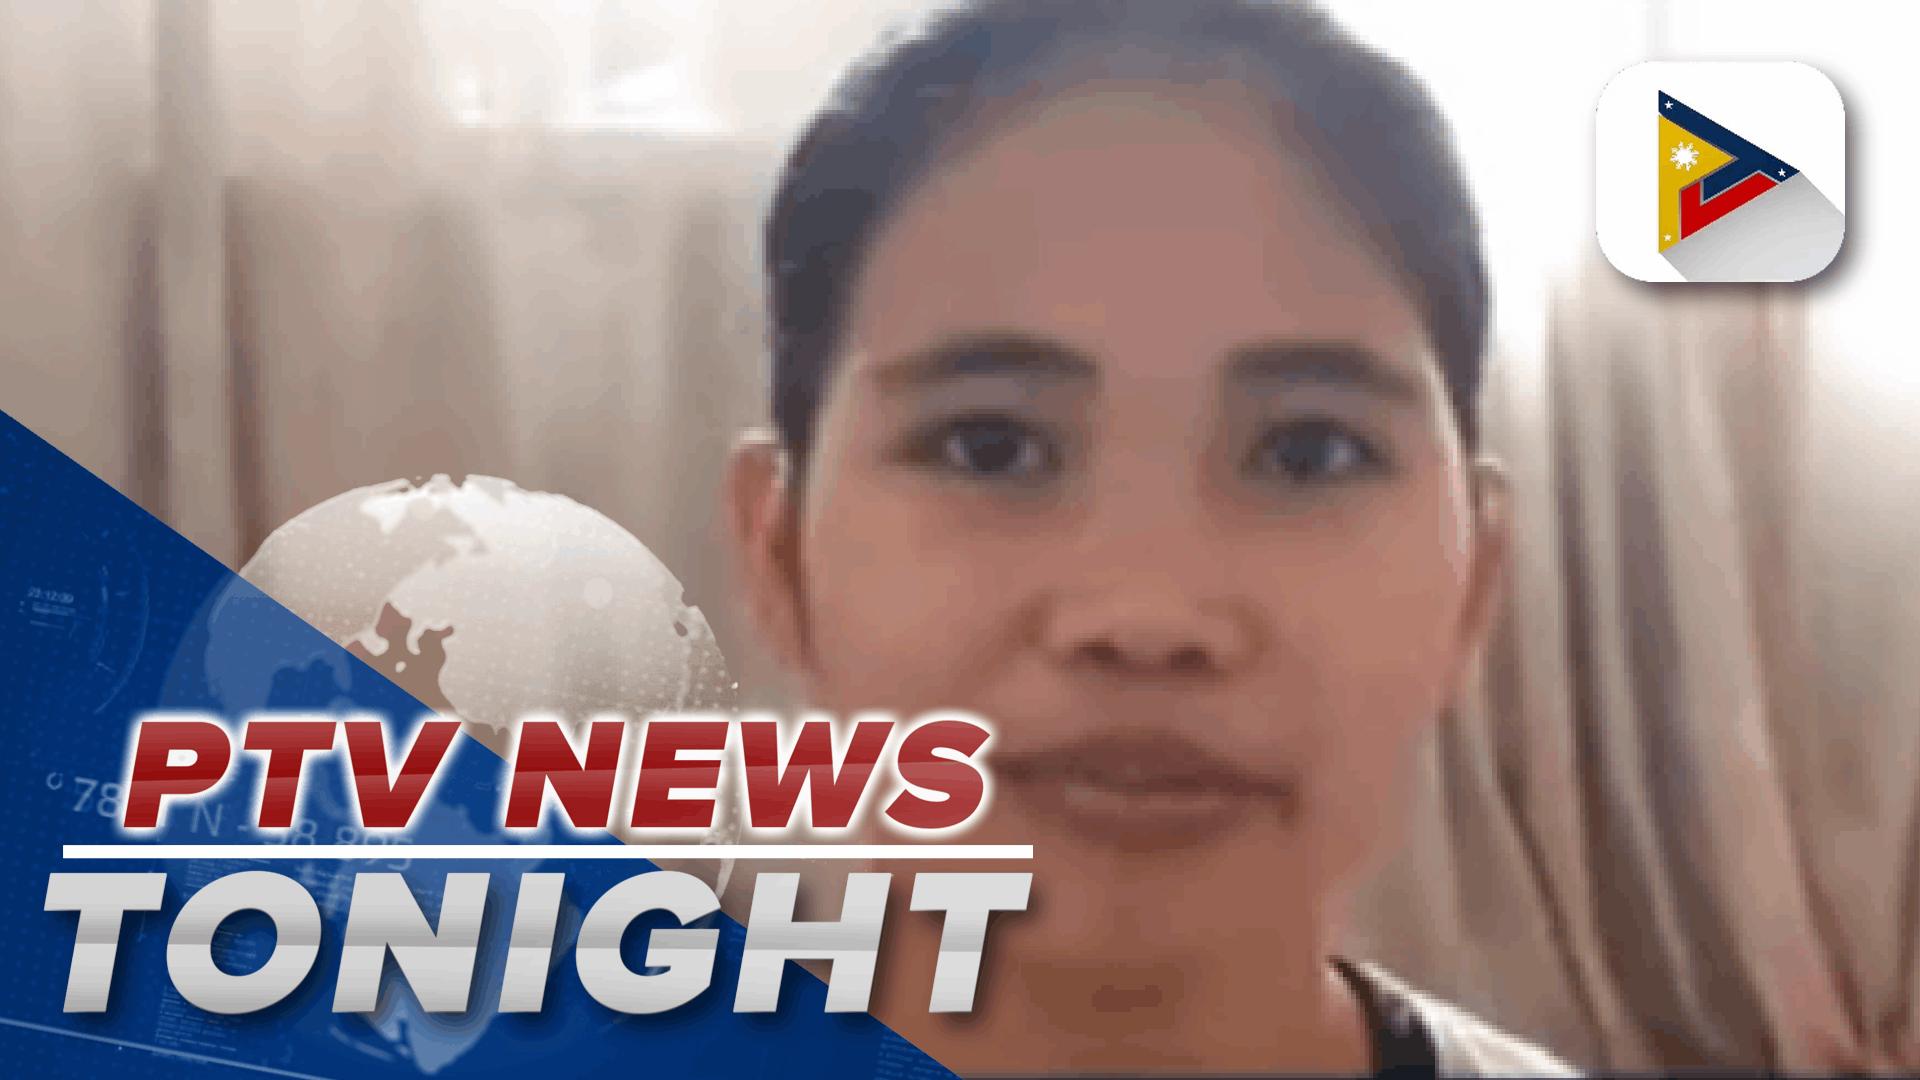 Filipino experience quarantine fatigue